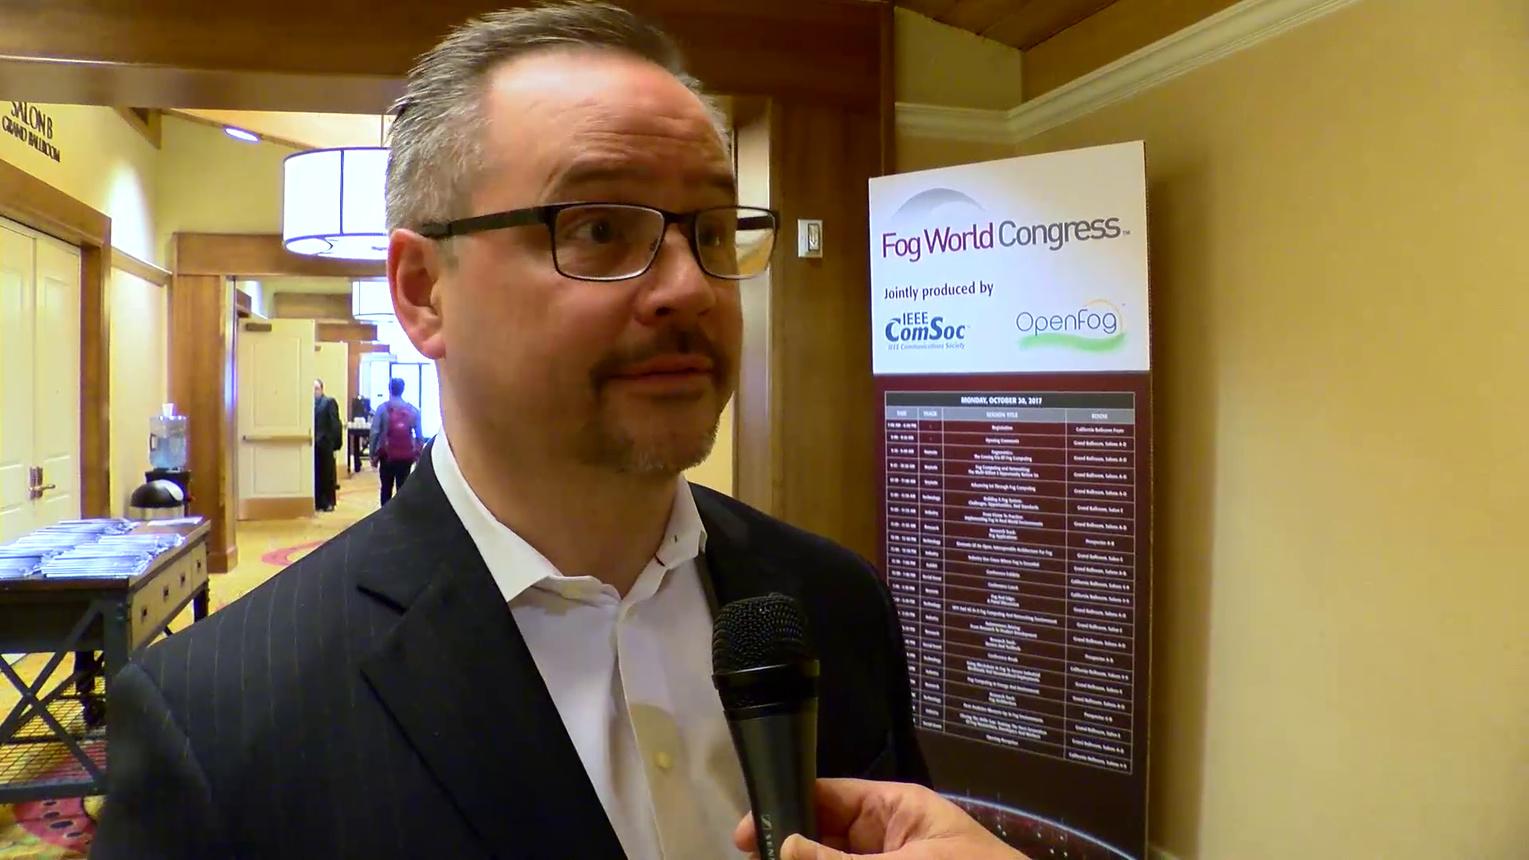 Christian Renaud on Fog Computing at Fog World Congress